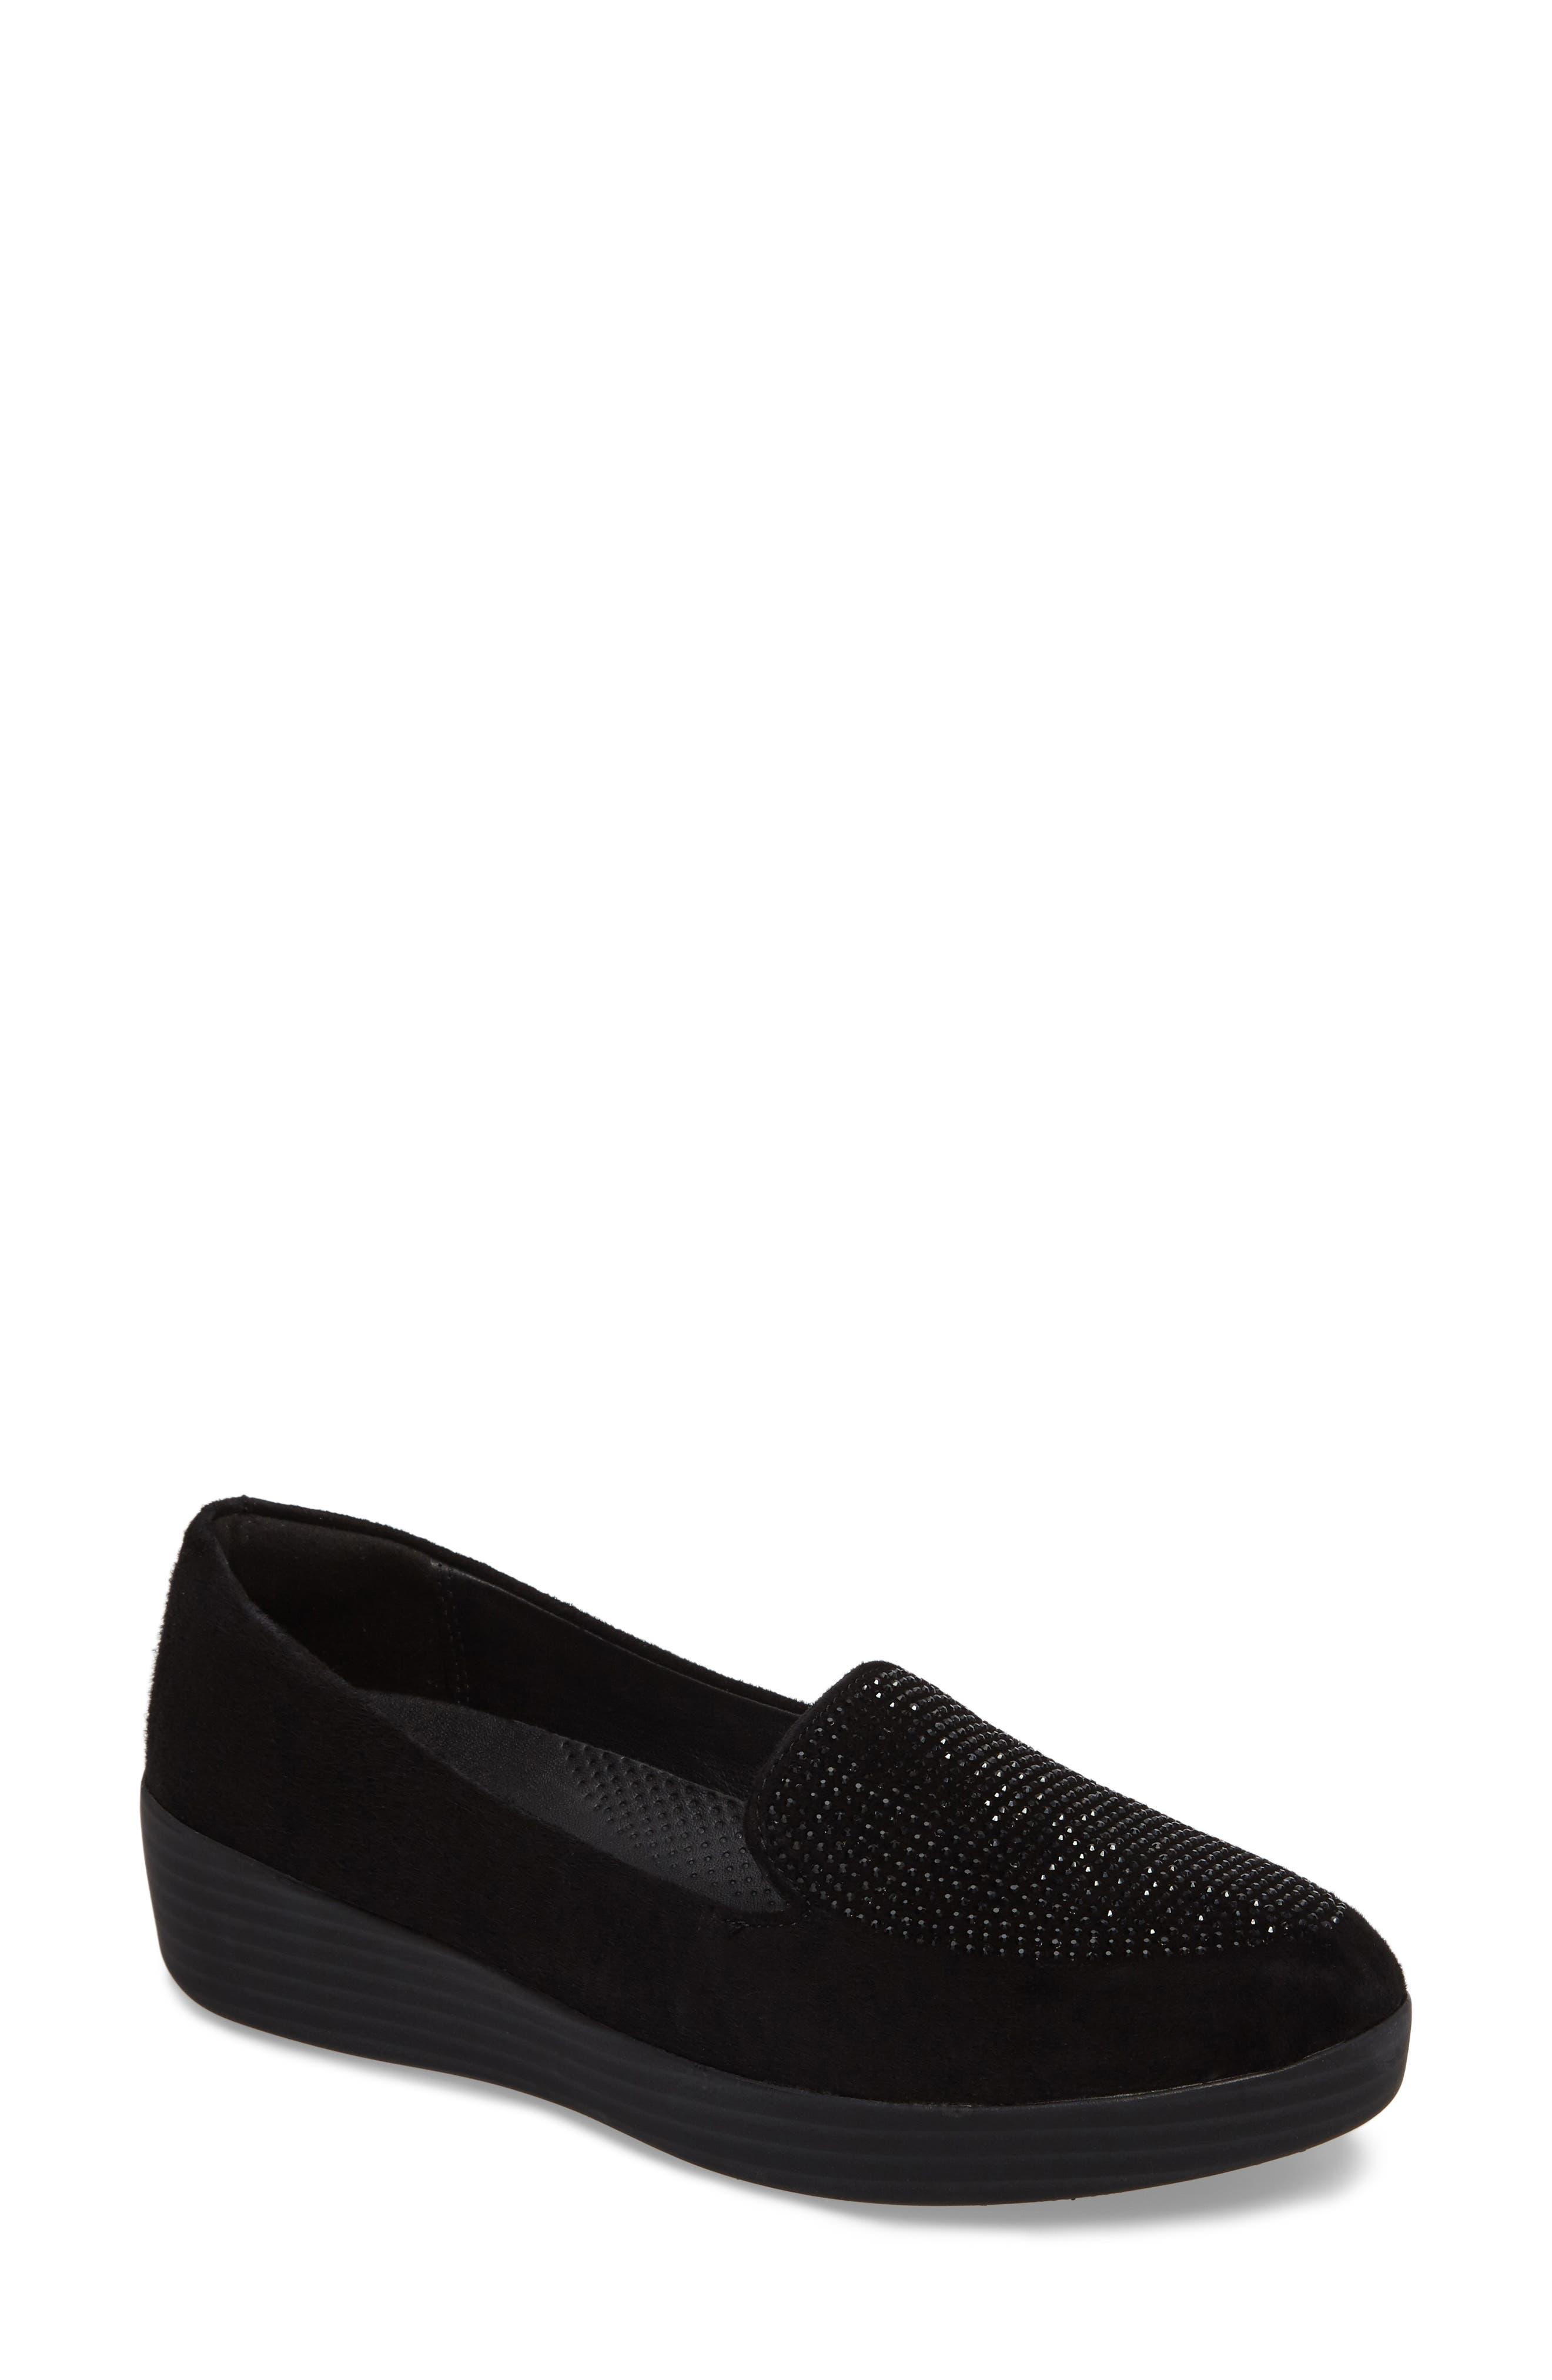 Sparkly Sneakerloafer Slip-On,                         Main,                         color, 001